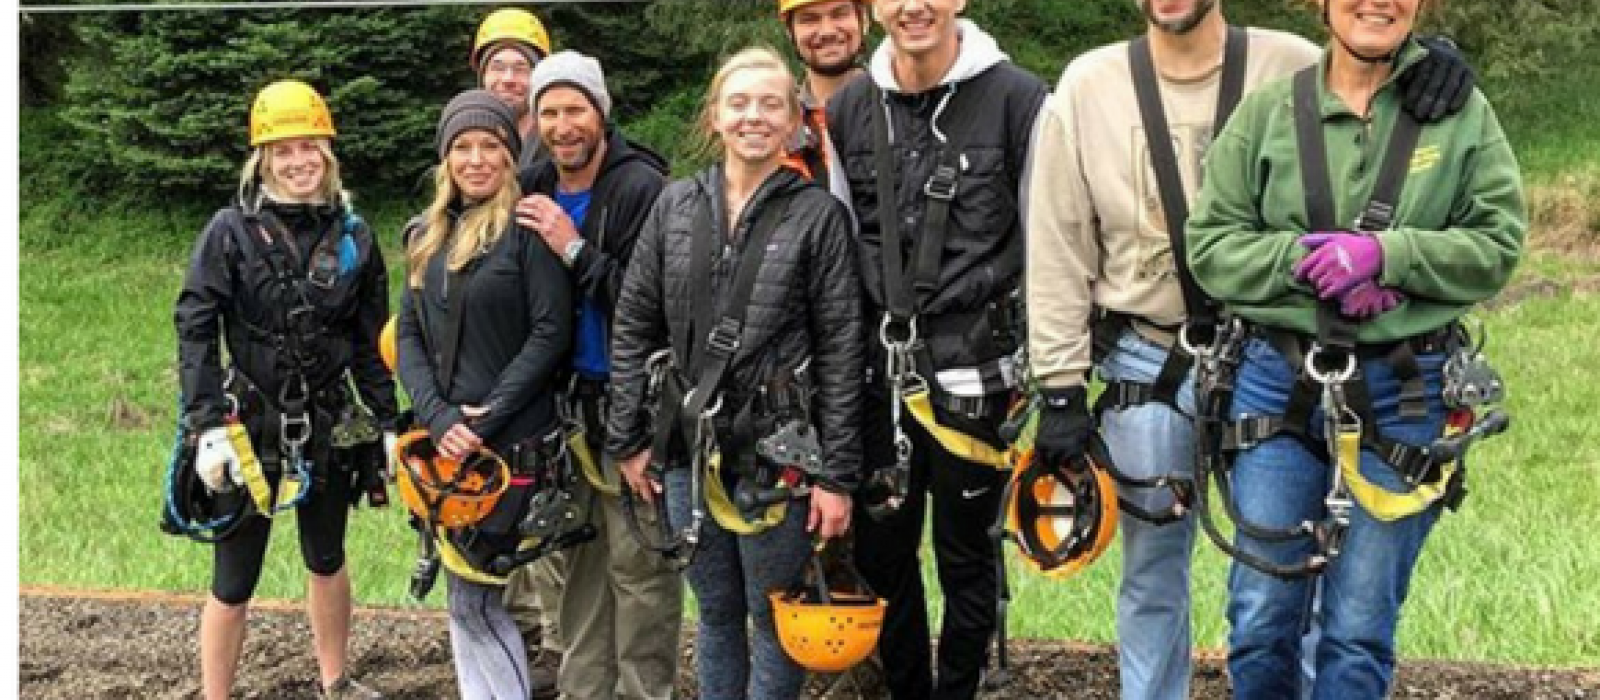 multi-generational group of tree climbers at Tree to Tree Adventure Park